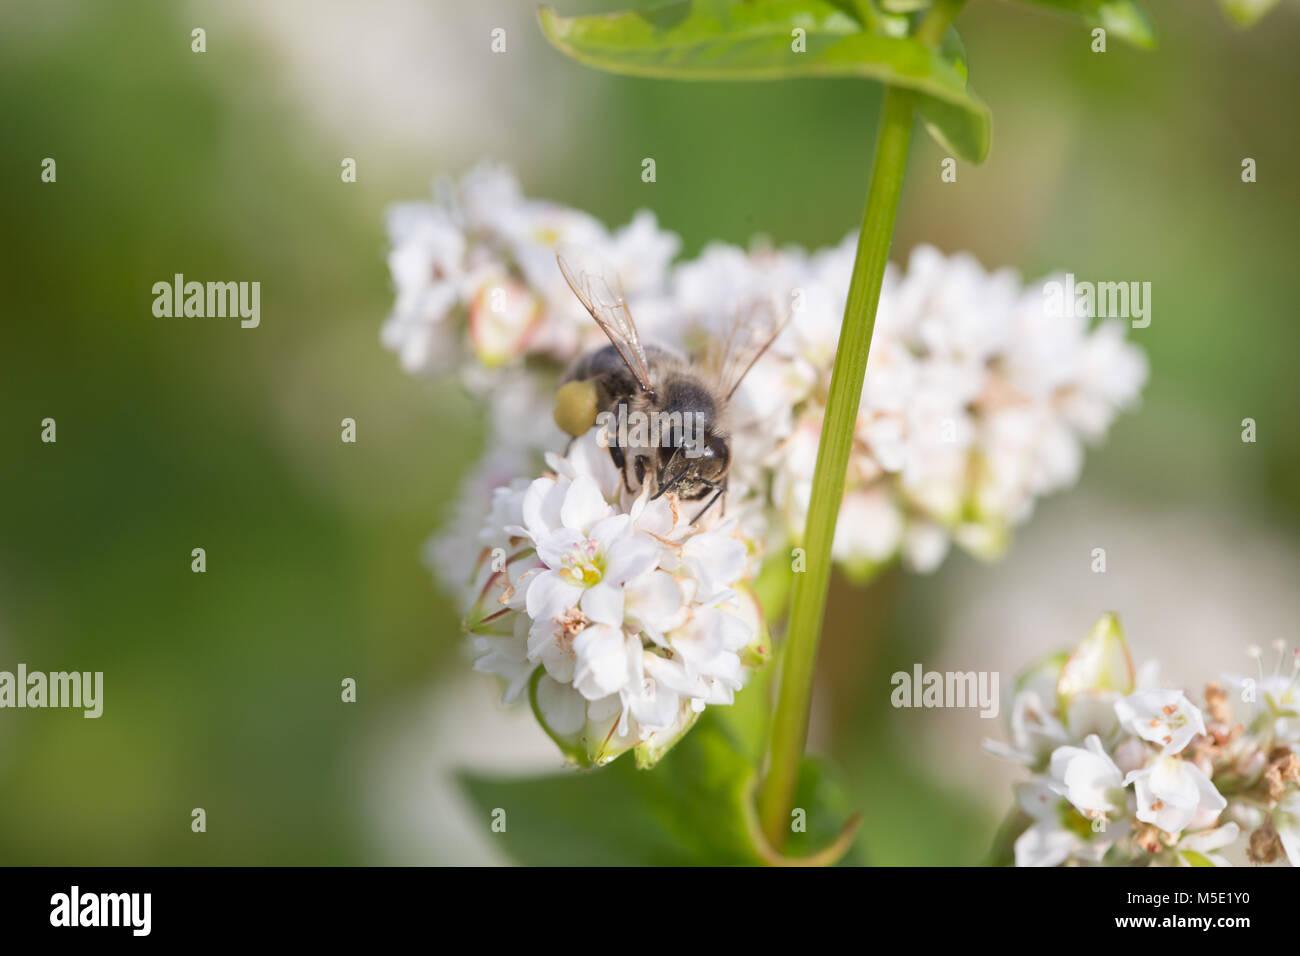 honey, beauty, floral, background, petal, white, nature, filthy, pollen, field, bee flower, sunny, proboscis, amazing, wings, radar, hive, labor Stock Photo